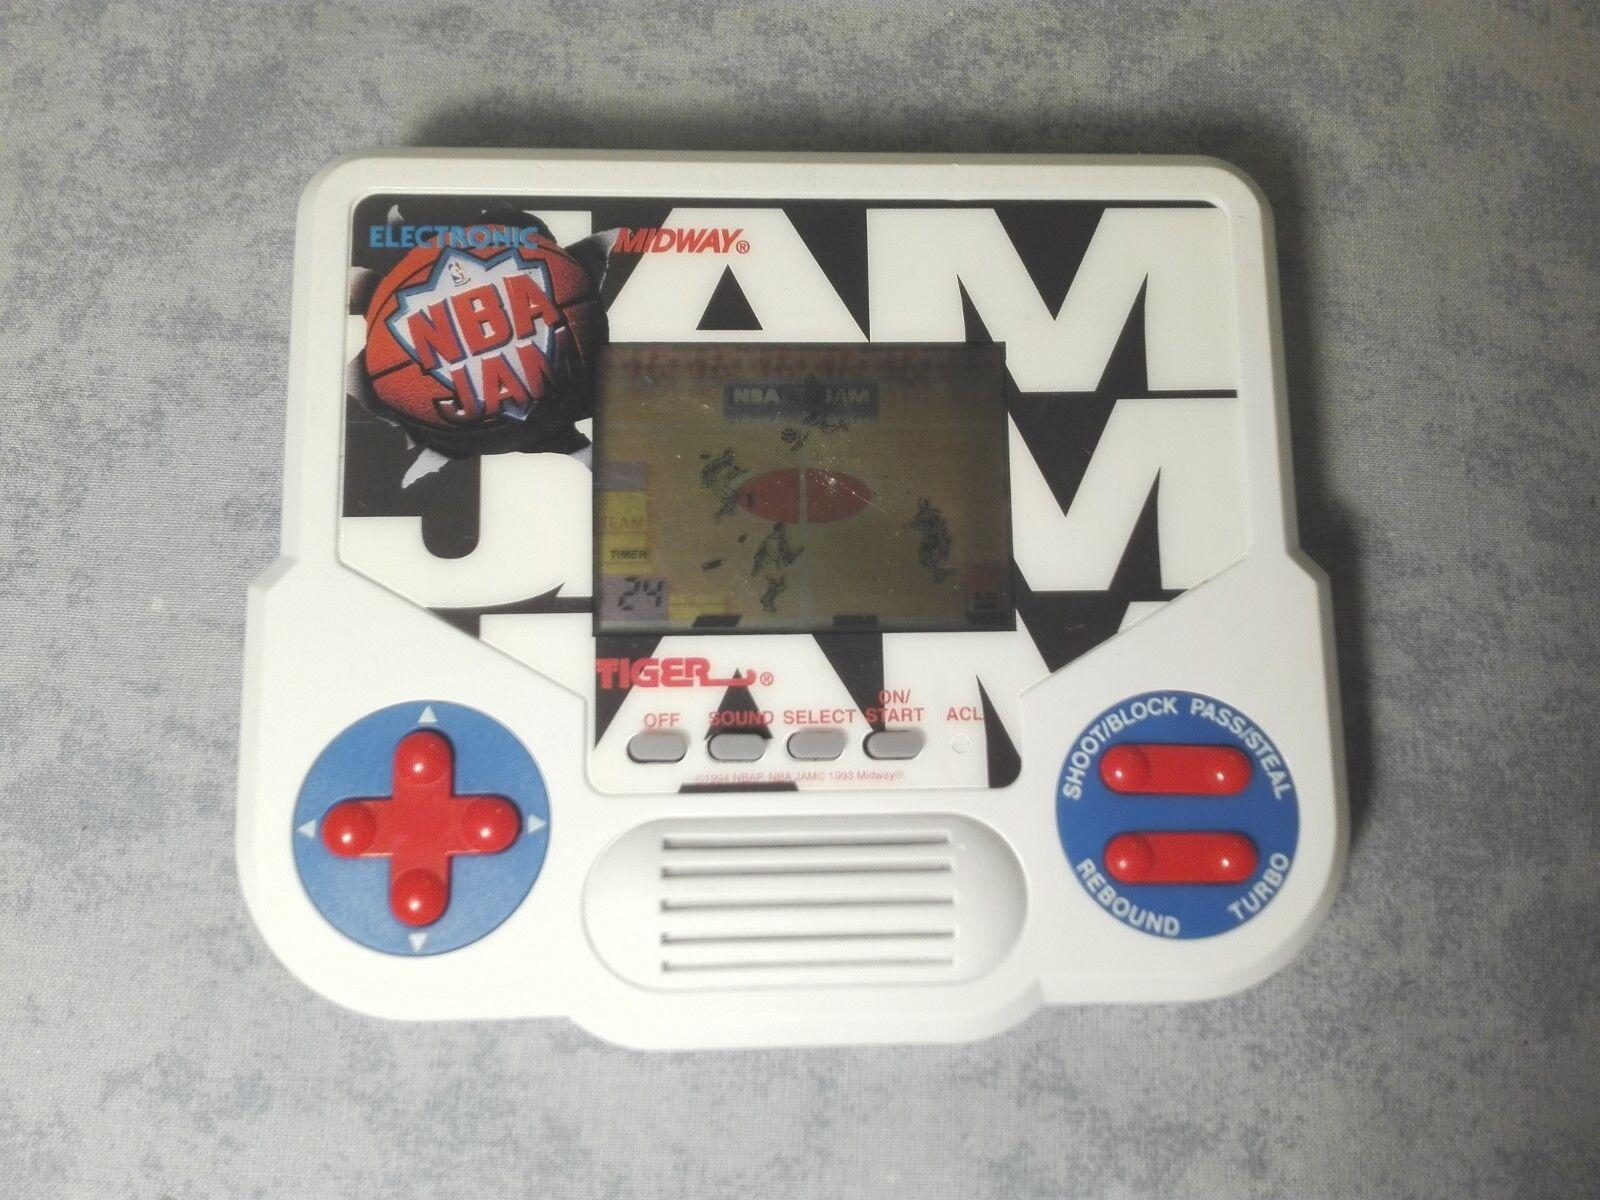 GIG TIGER ELECTRONIC NBA JAM GAME & WATCH HANDHELD CONSOLE LCD SCREEN - FUNZIONA